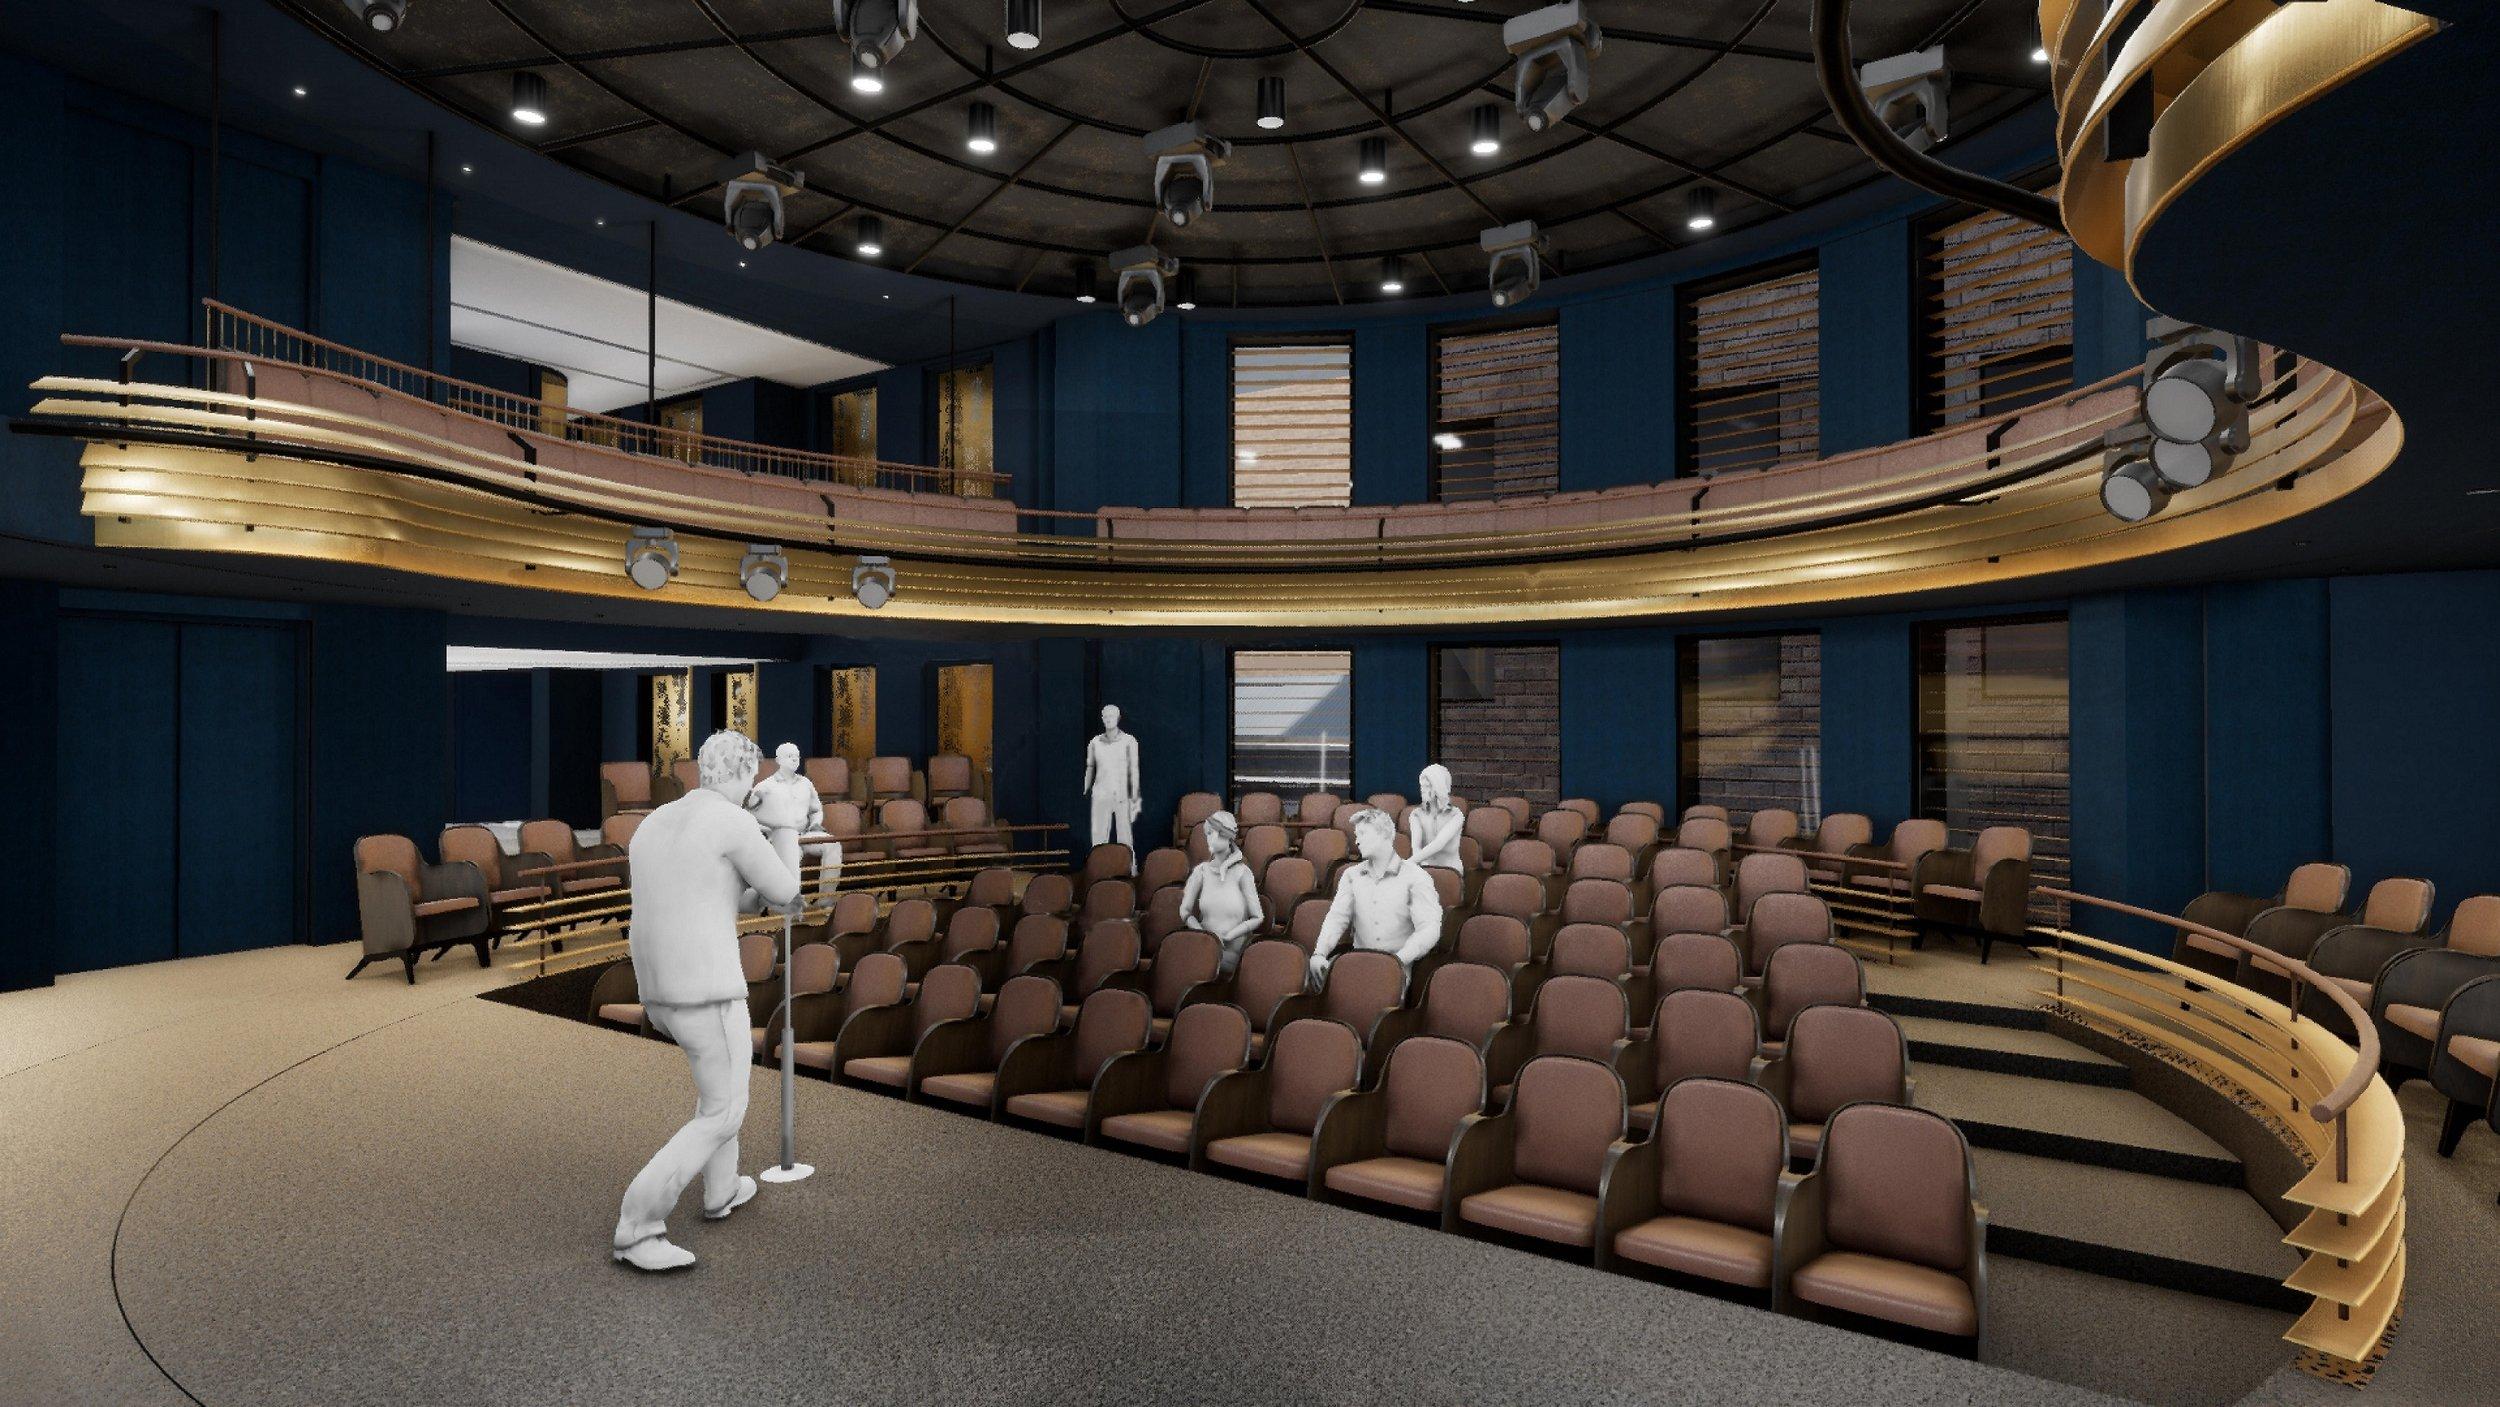 Artist-Impression-of-Boulevard-Theatre.-Credit-SODA-studio-2.jpg